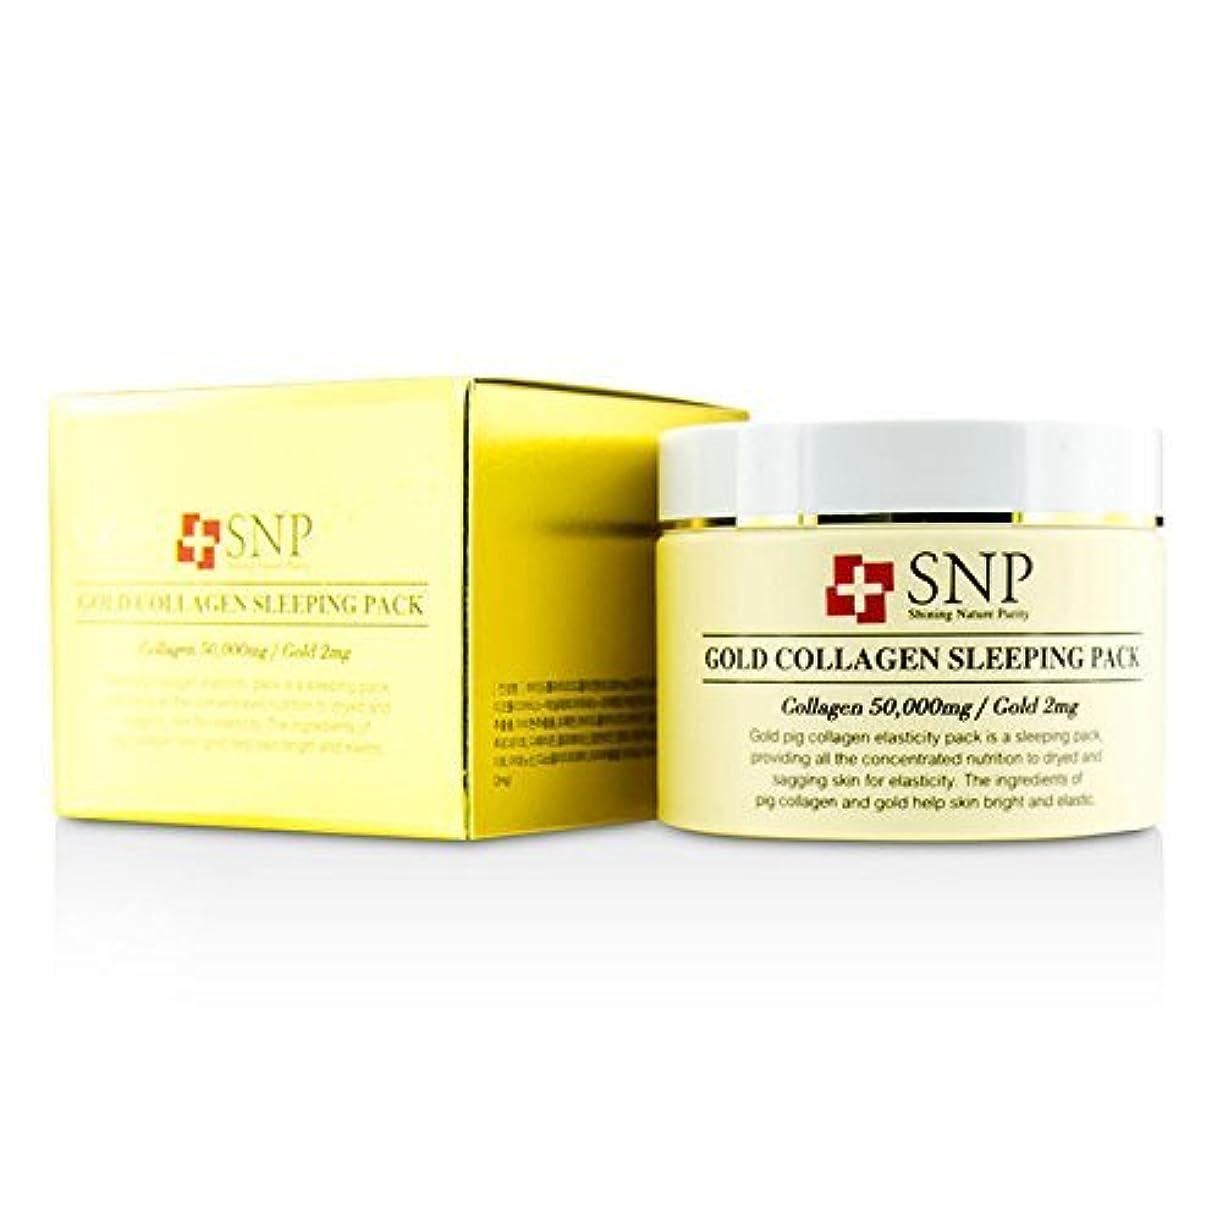 SNP ゴールドコラーゲン スリーピングパック Gold Collagen Sleeping Pack - Elasticity 100g/3.5oz [並行輸入品] 睡眠パック